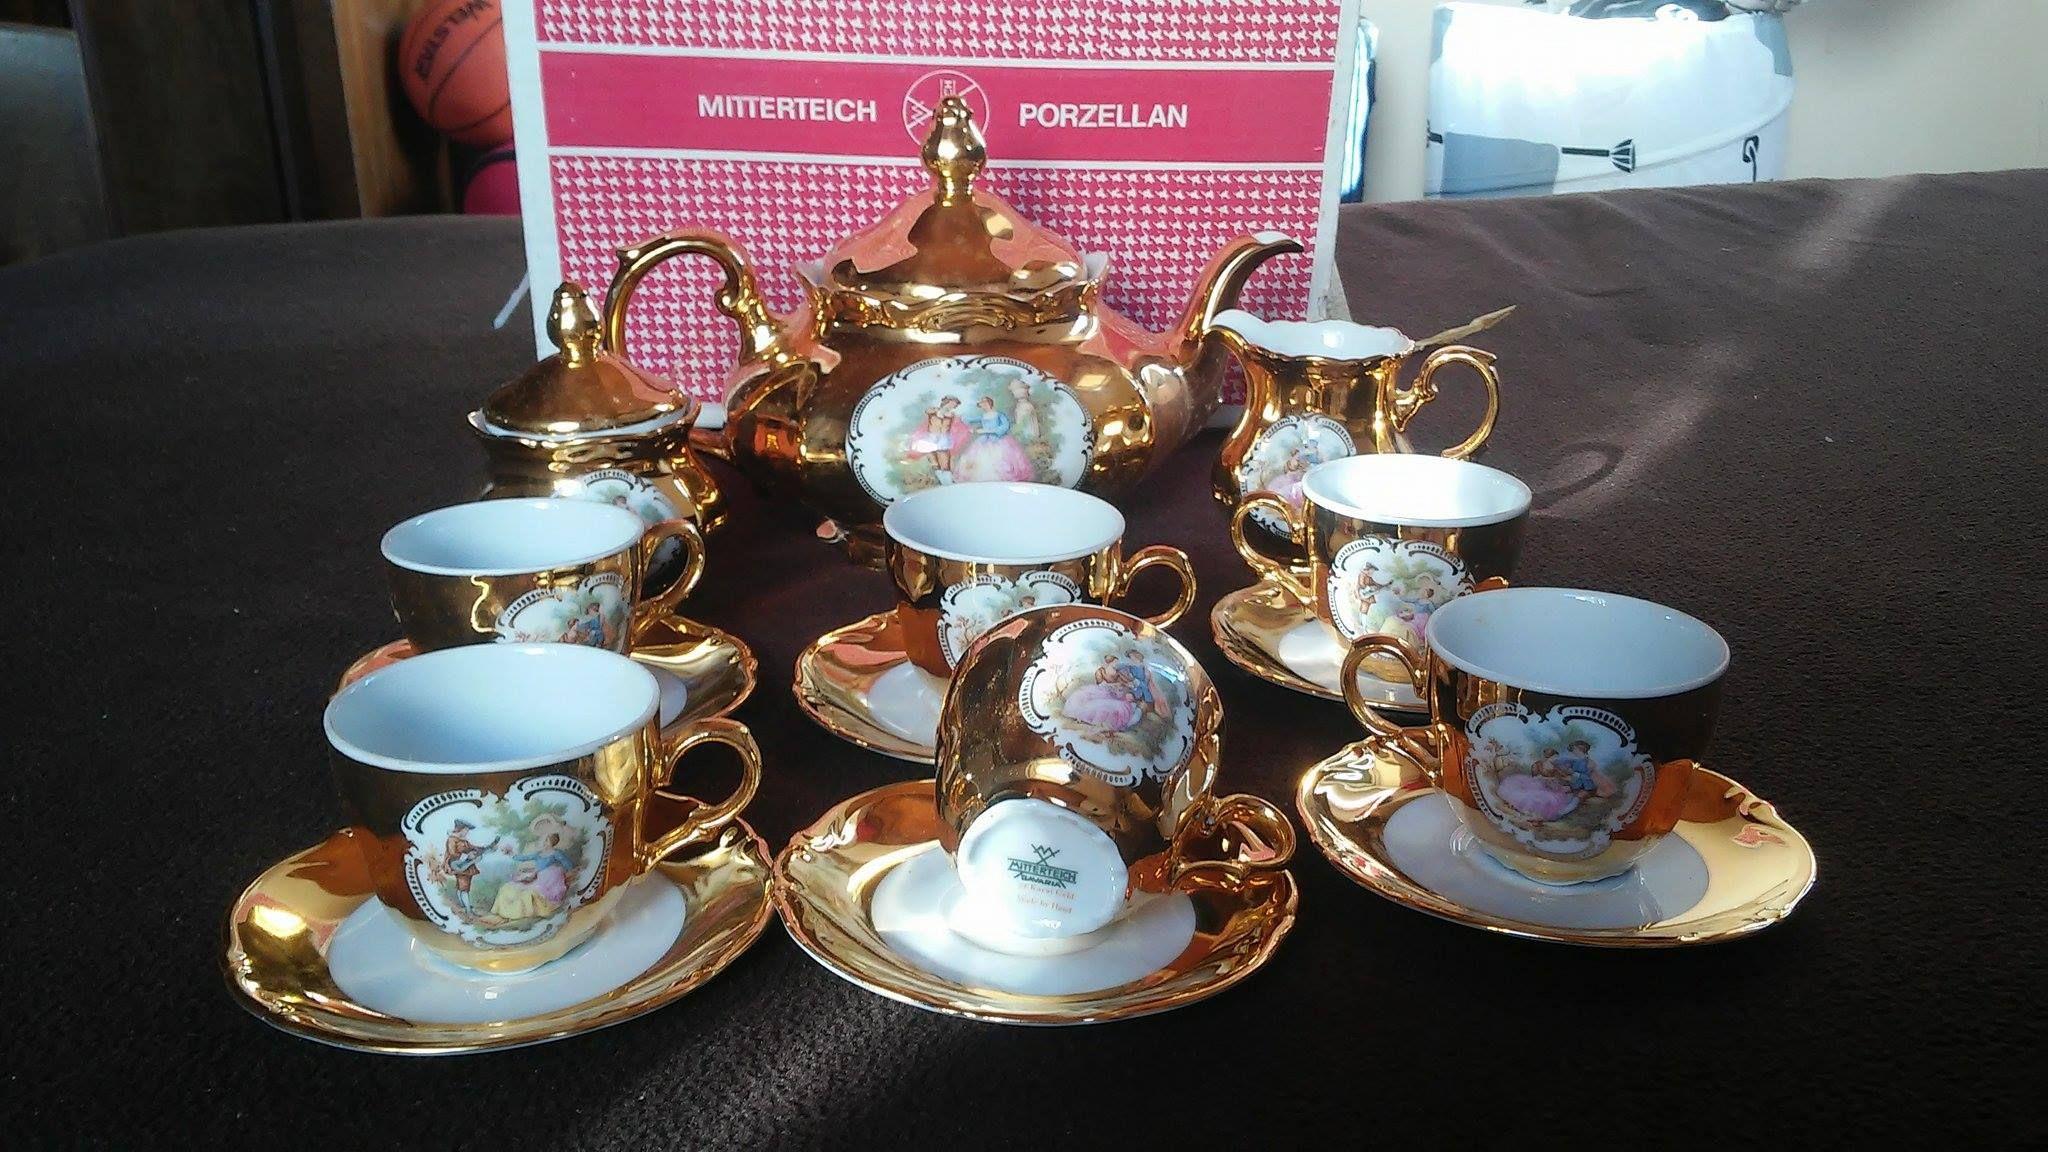 antique 24 karat gold over porzellan germany mitterteich bavaria coffee tea set hand. Black Bedroom Furniture Sets. Home Design Ideas